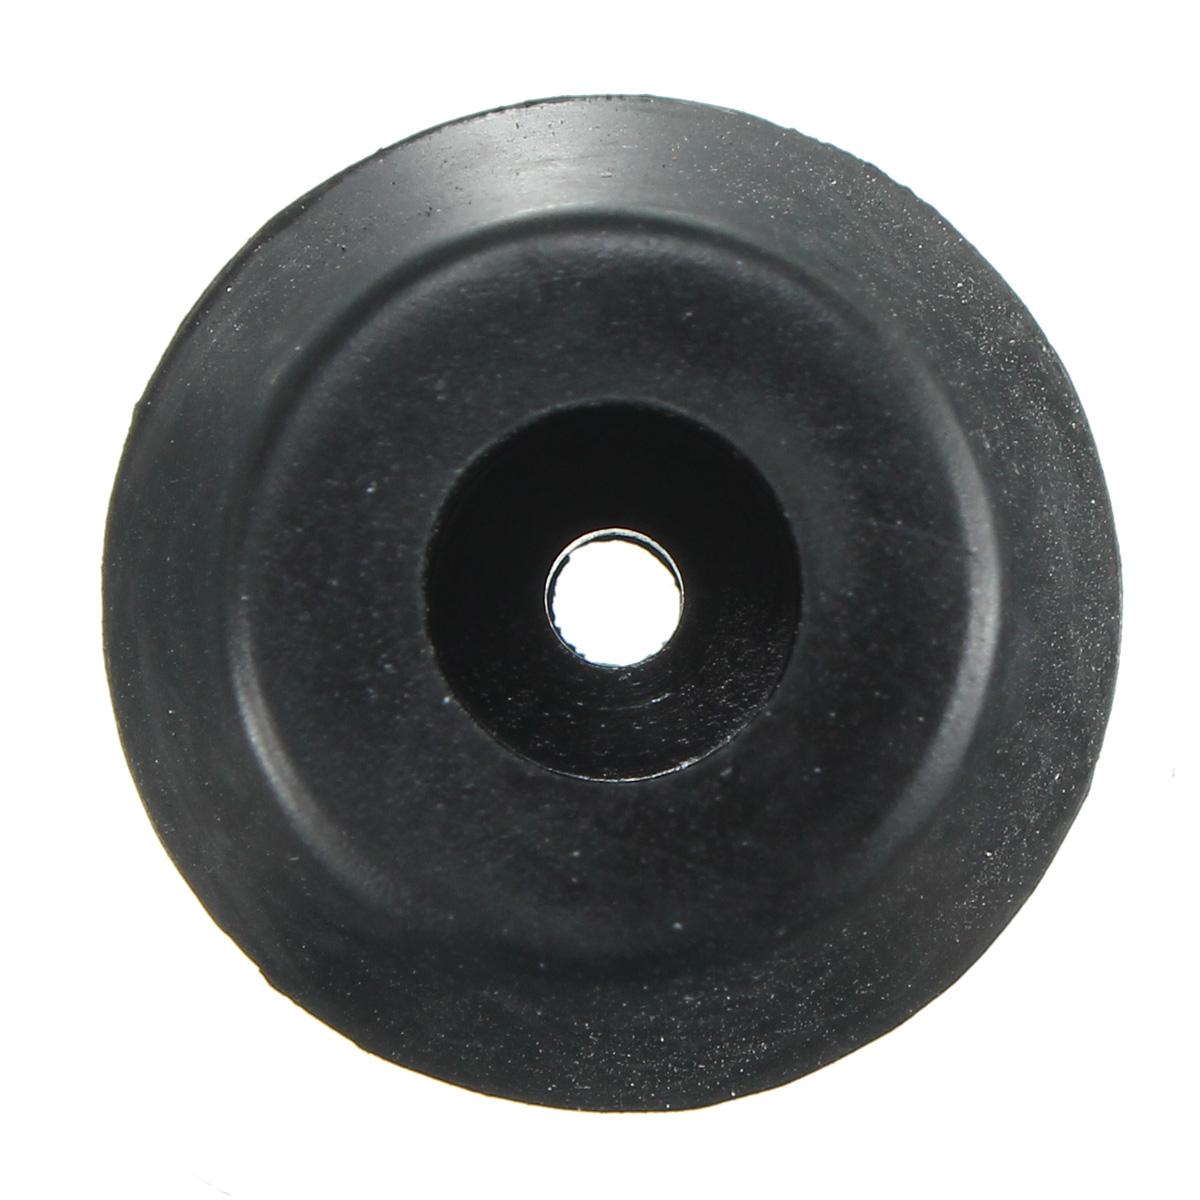 12pcs 25x20x15mm Black Rubber Protector For Chair Leg